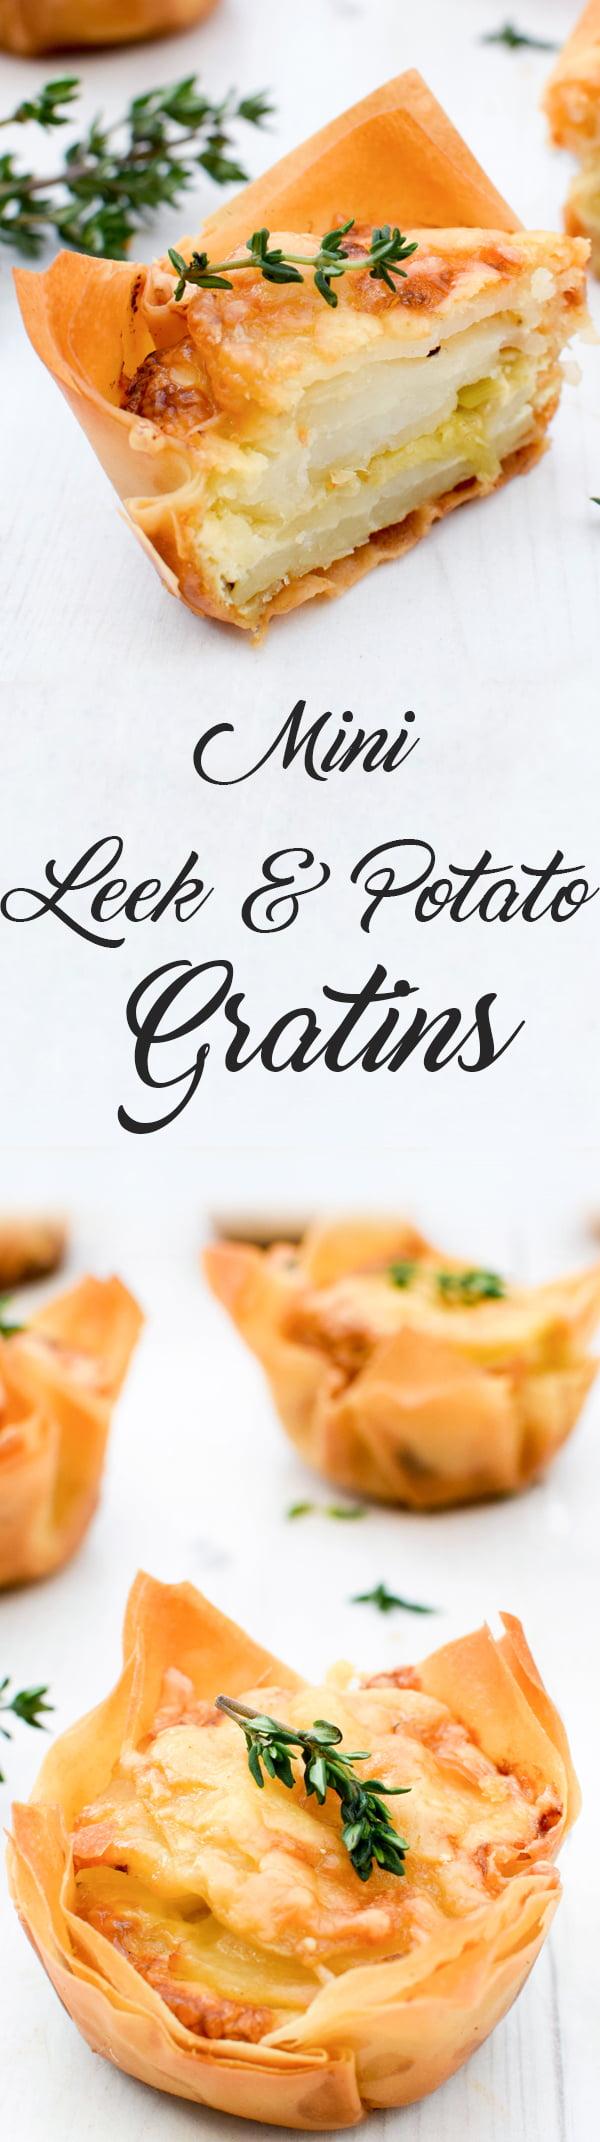 Mini Leek & Potato Gratins [vegetarian] by The Flexitarian